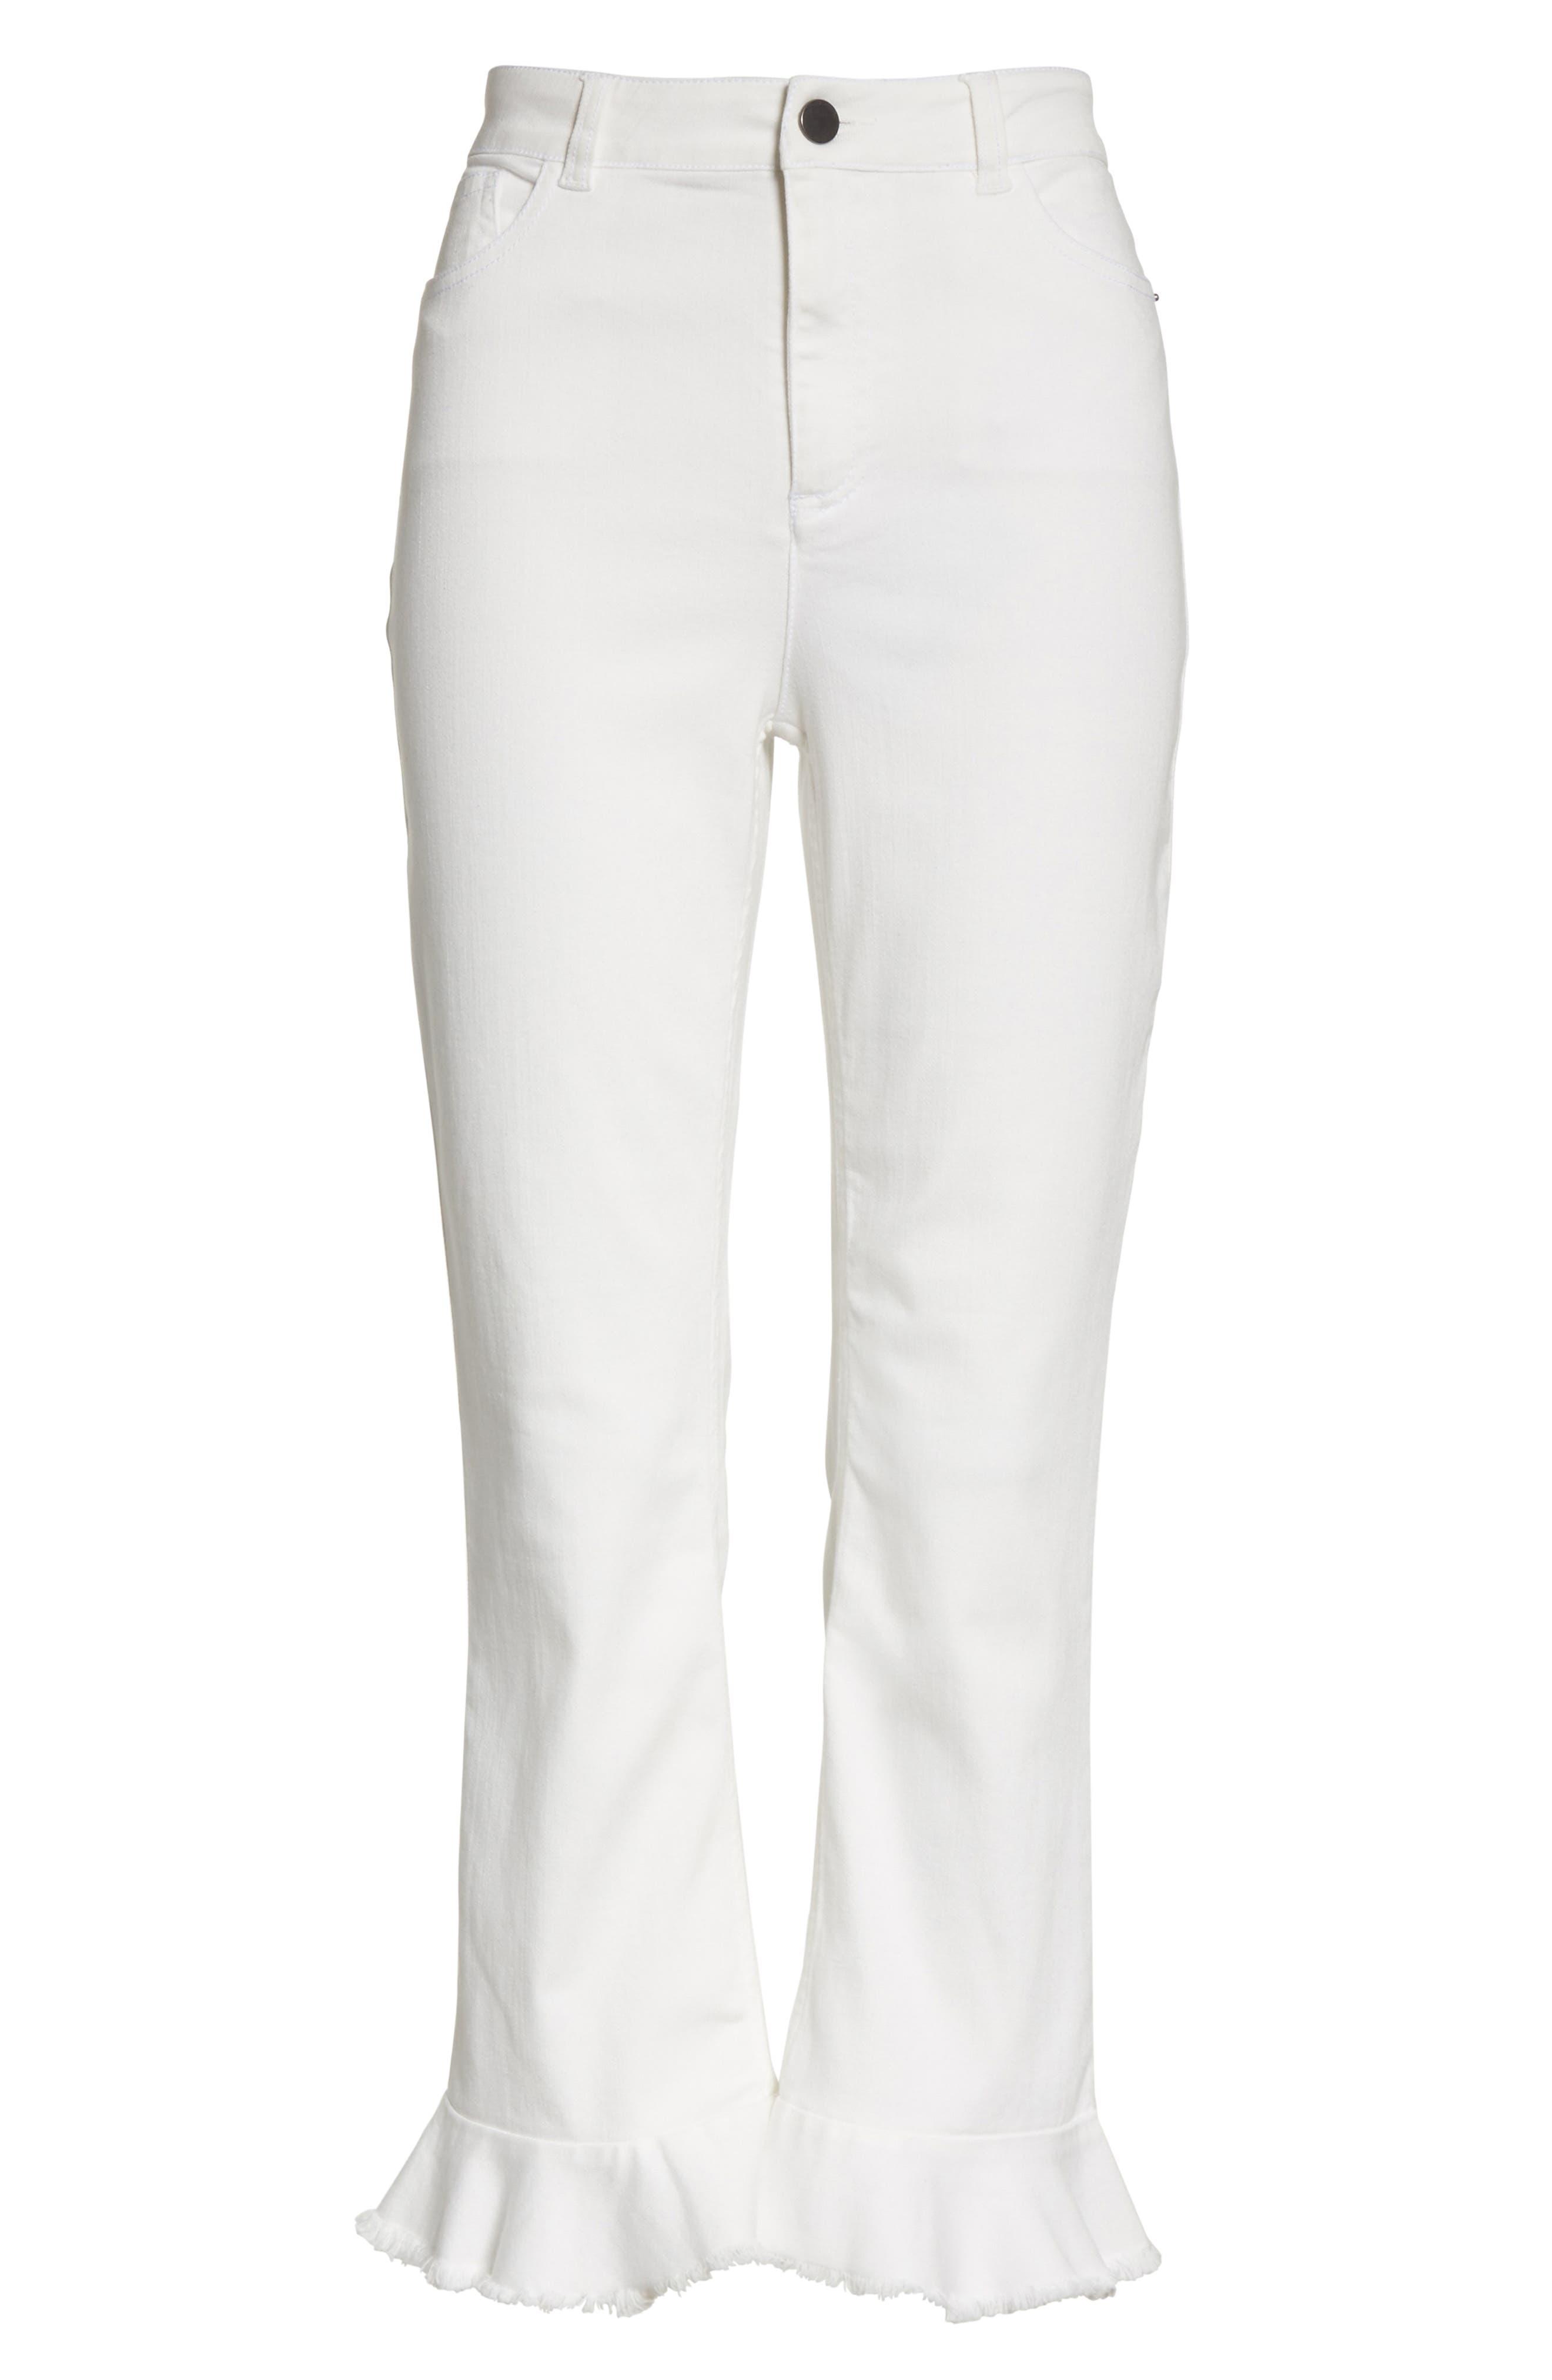 AO.LA Zoe Ruffle Hem Crop Jeans,                             Alternate thumbnail 6, color,                             White